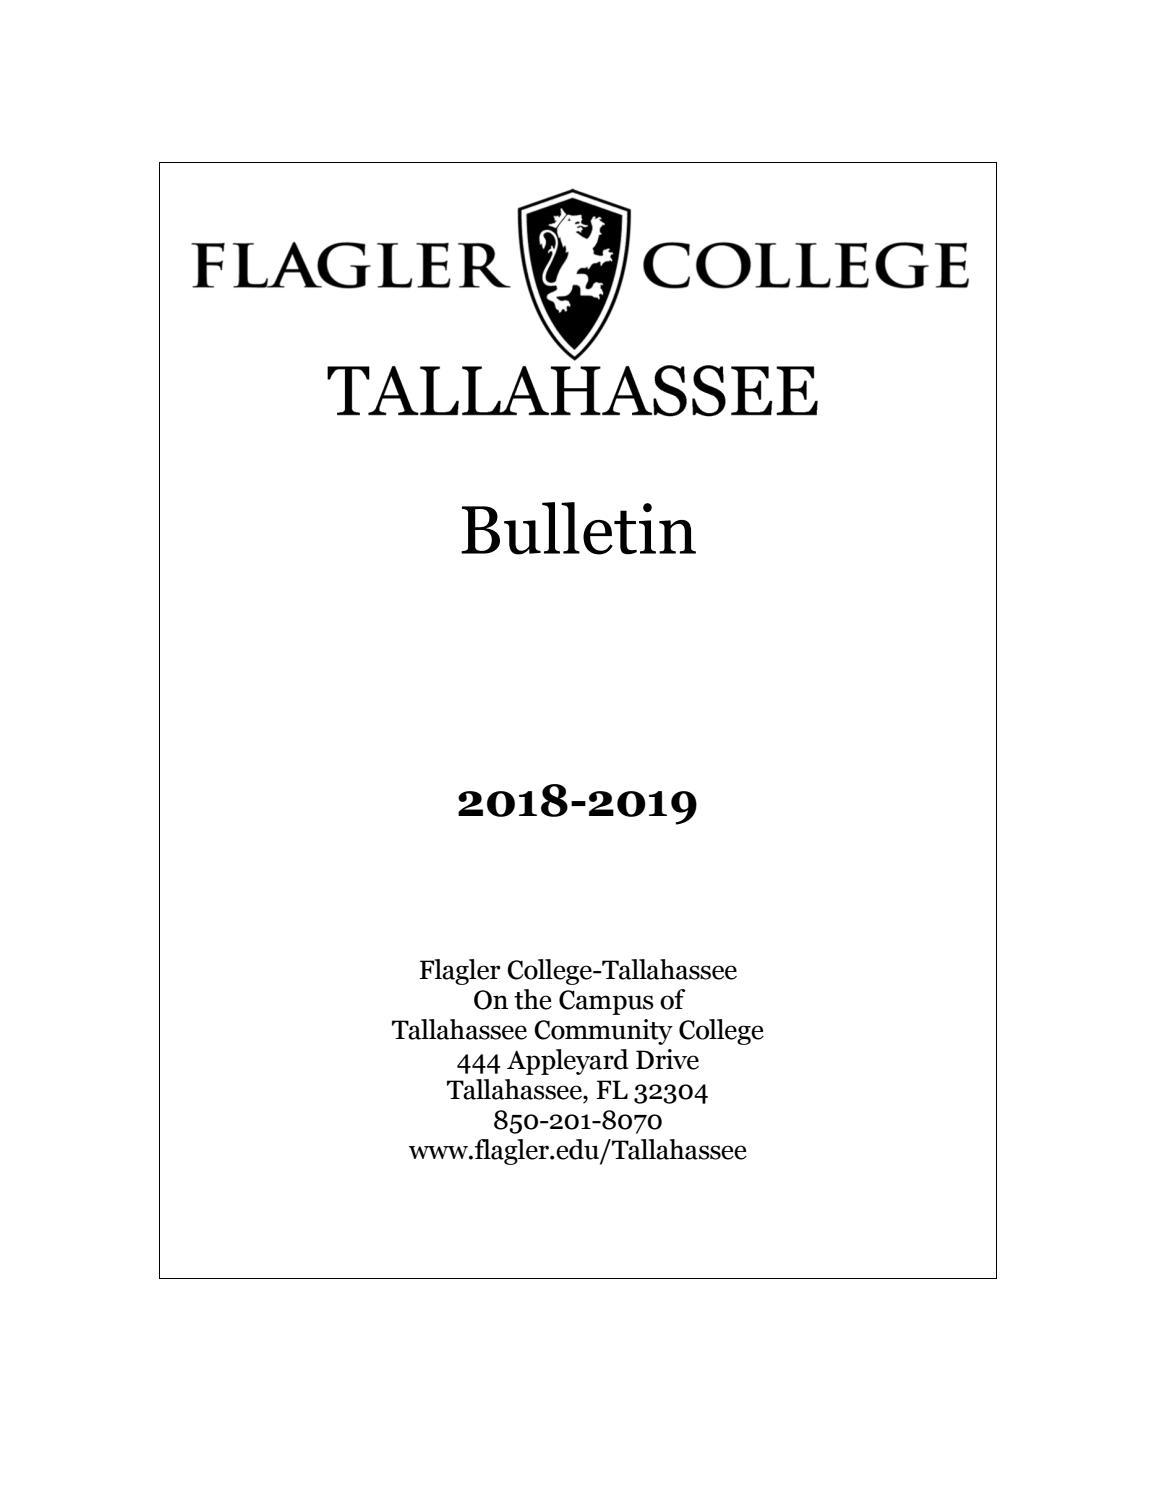 2018 - 2019 Bulletin by Flagler College - issuu